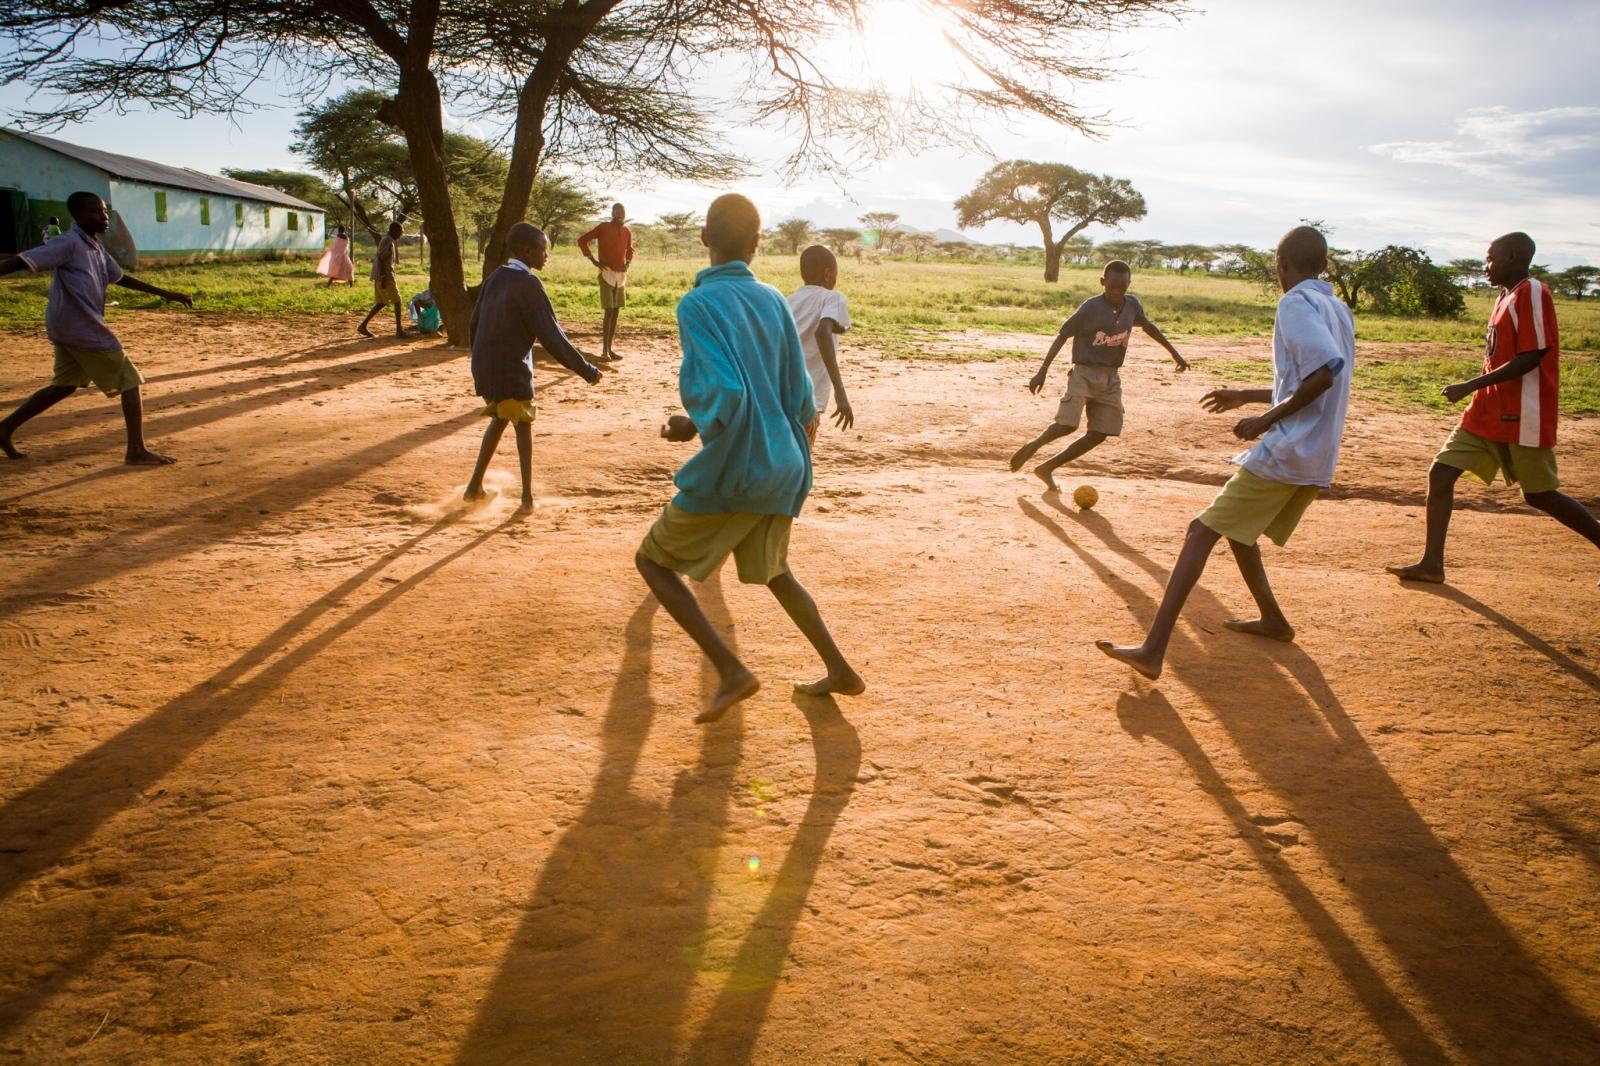 Fütbol. Wamba, Kenya.